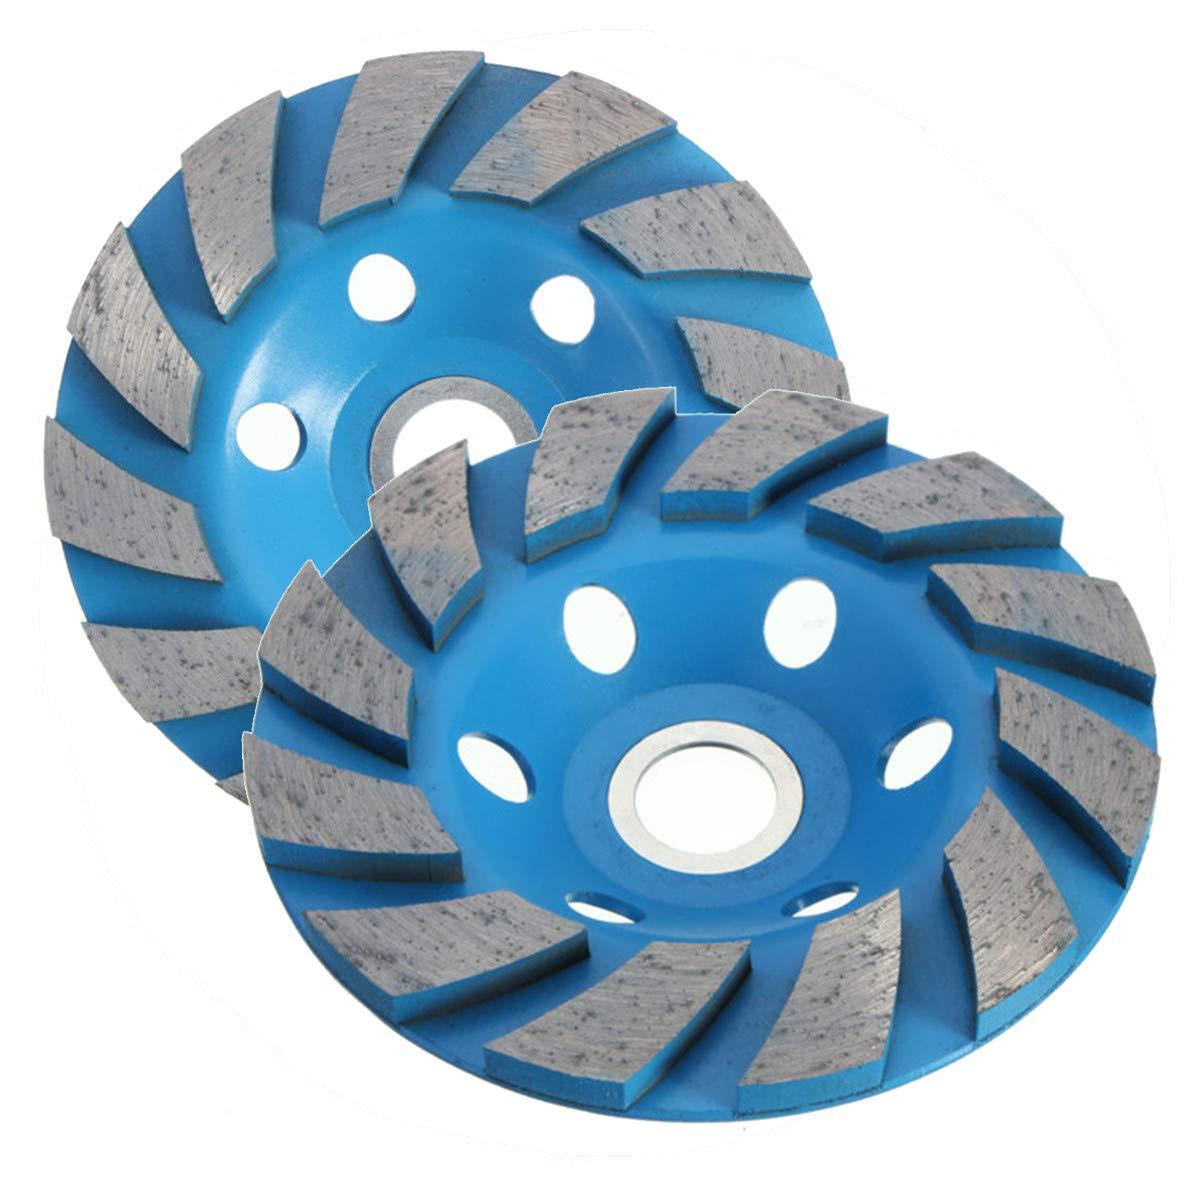 2PCS 4 Inch Diamond Cup Grinding Wheel V/ÉZAAR Angle Grinder Segment Grinding Disc Granite Marble Concrete